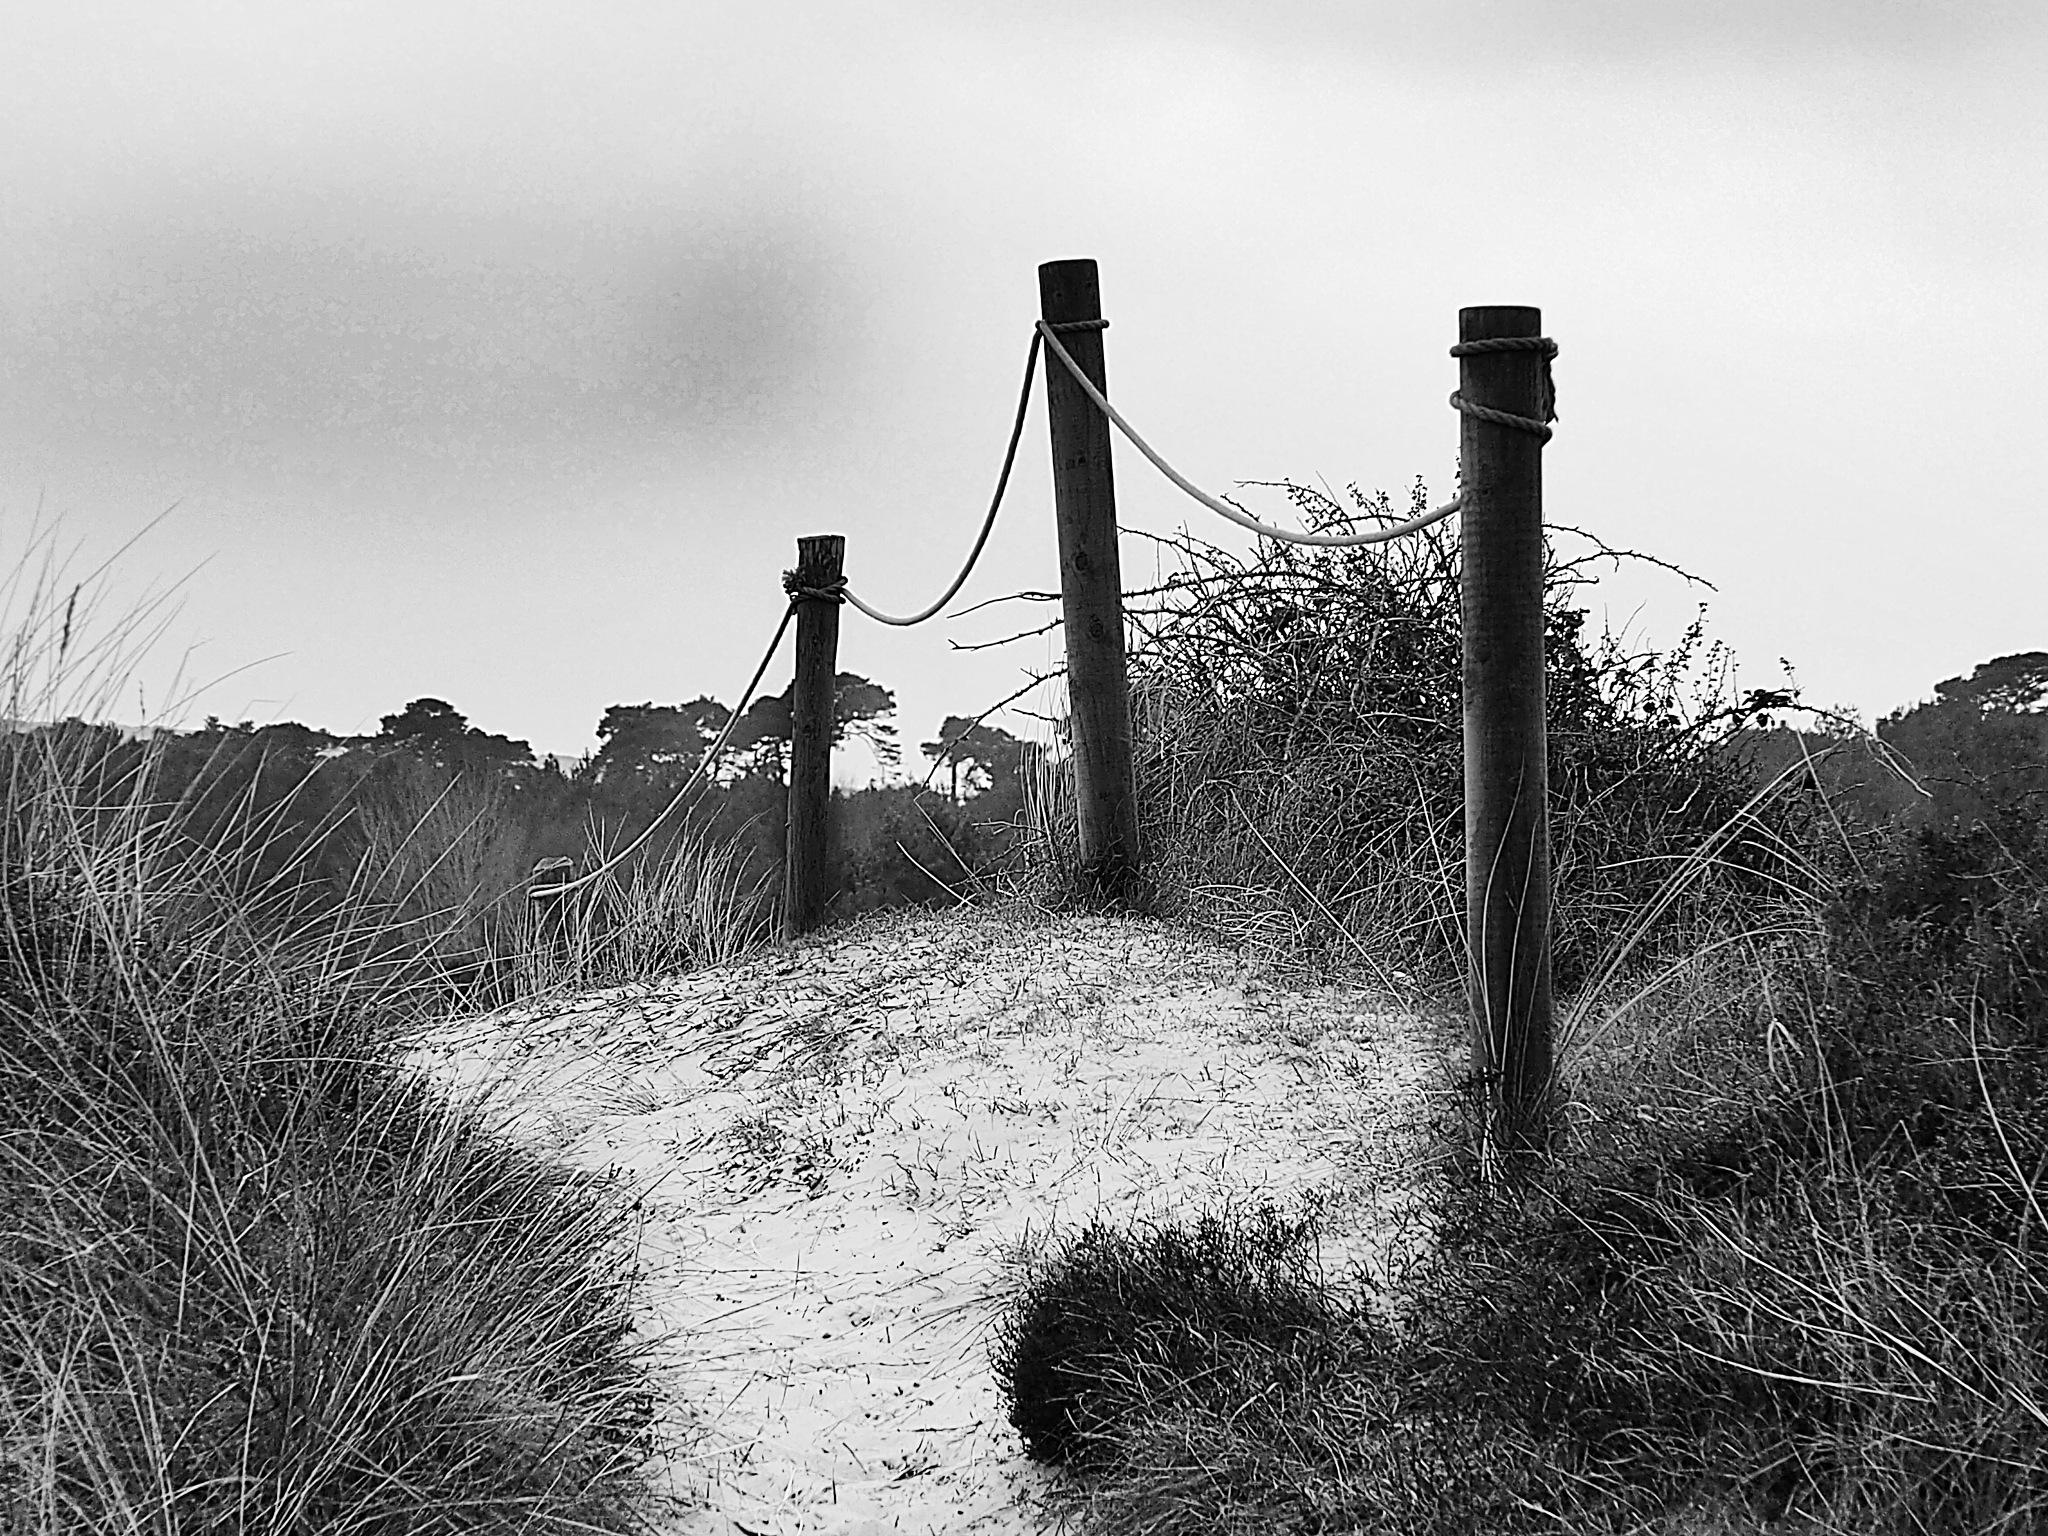 path through the dunes by james arthur